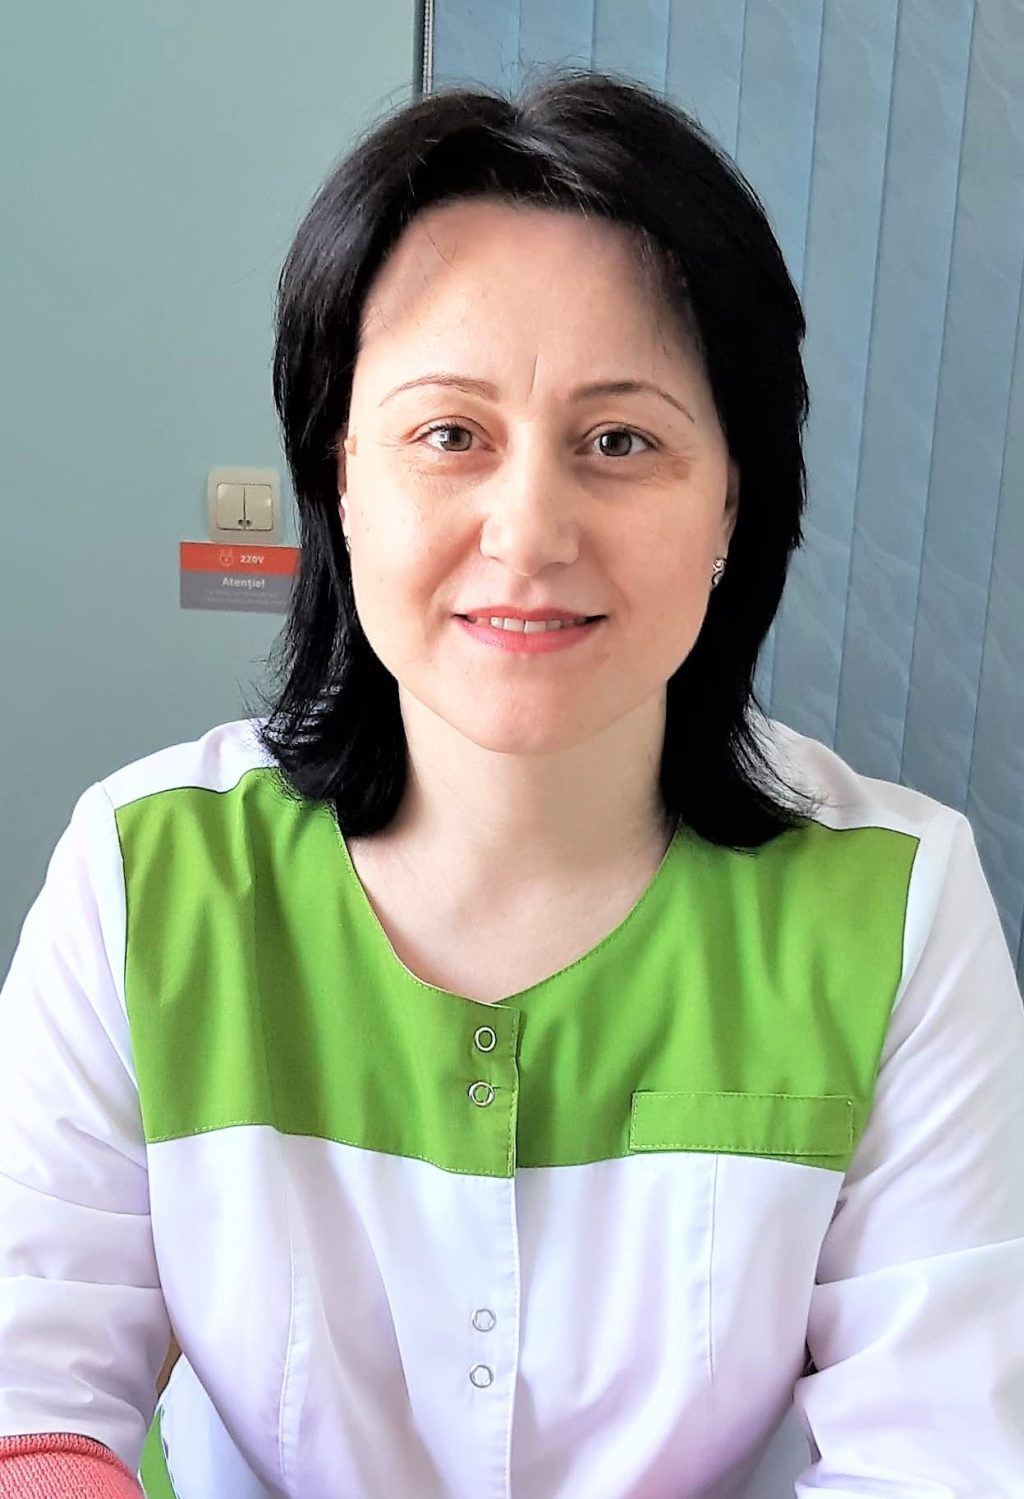 Endocrinolog Mihaila.jpg